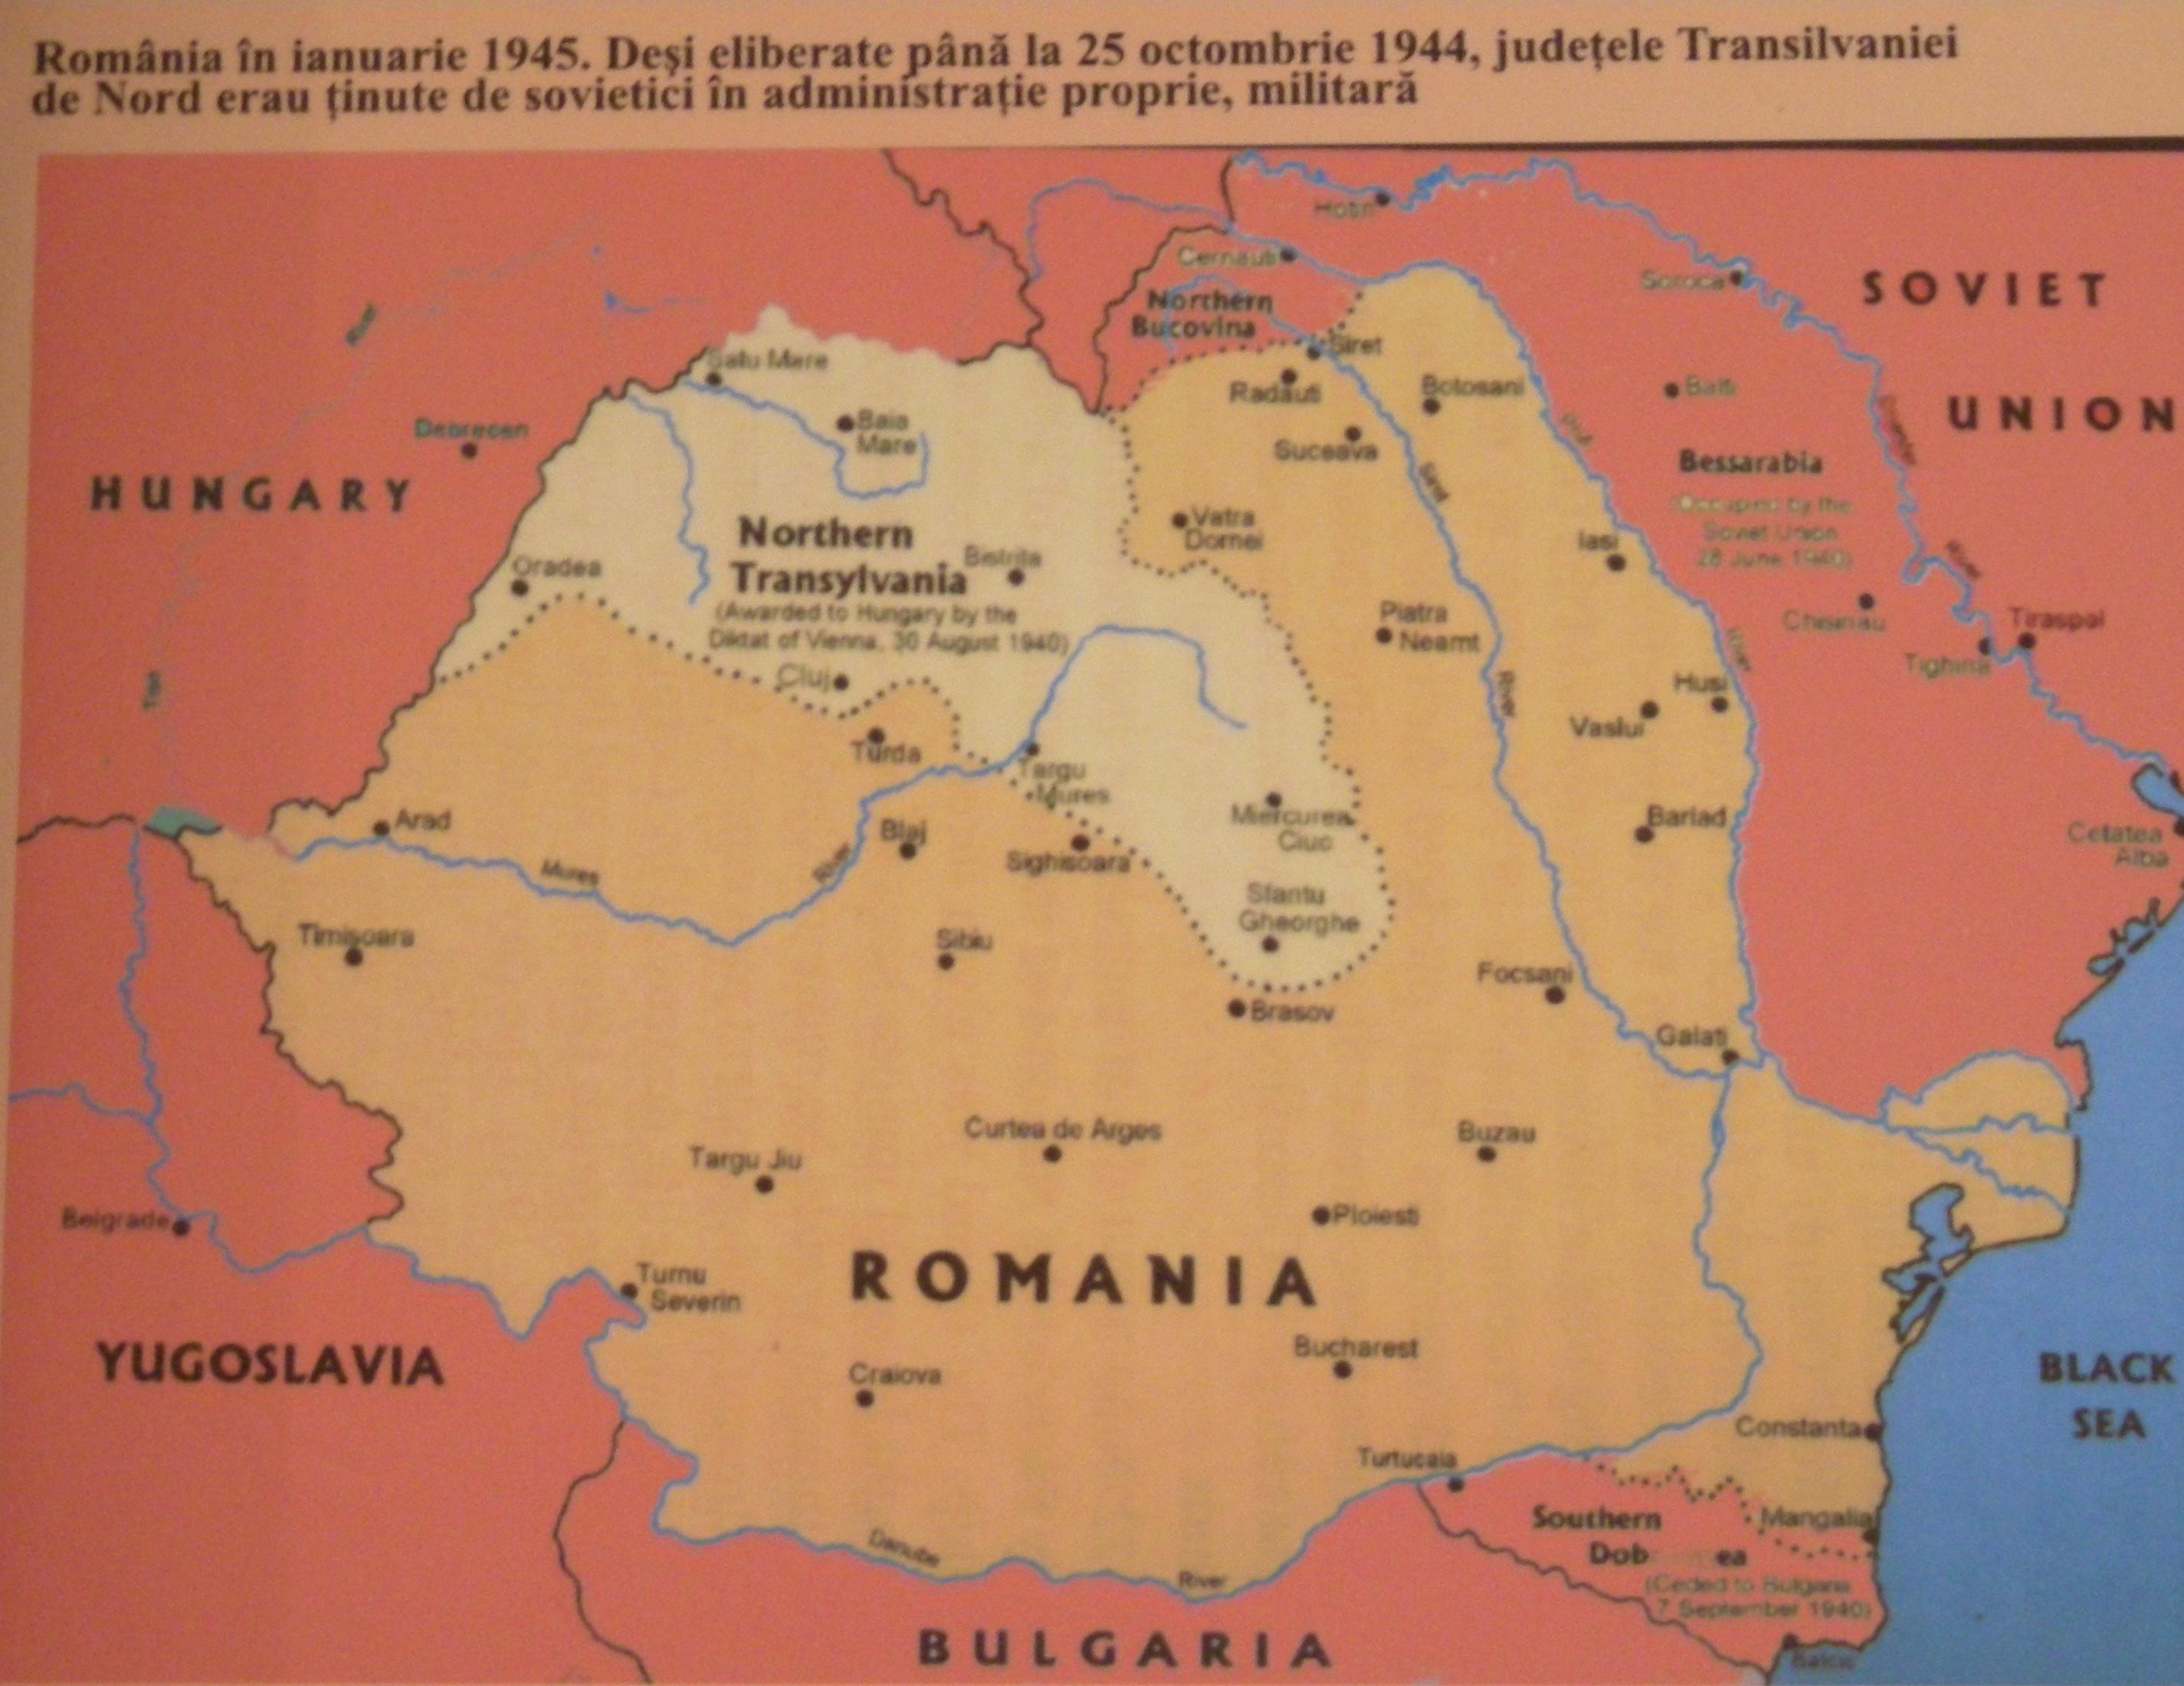 File:Romania January 1945.jpg - Wikipedia